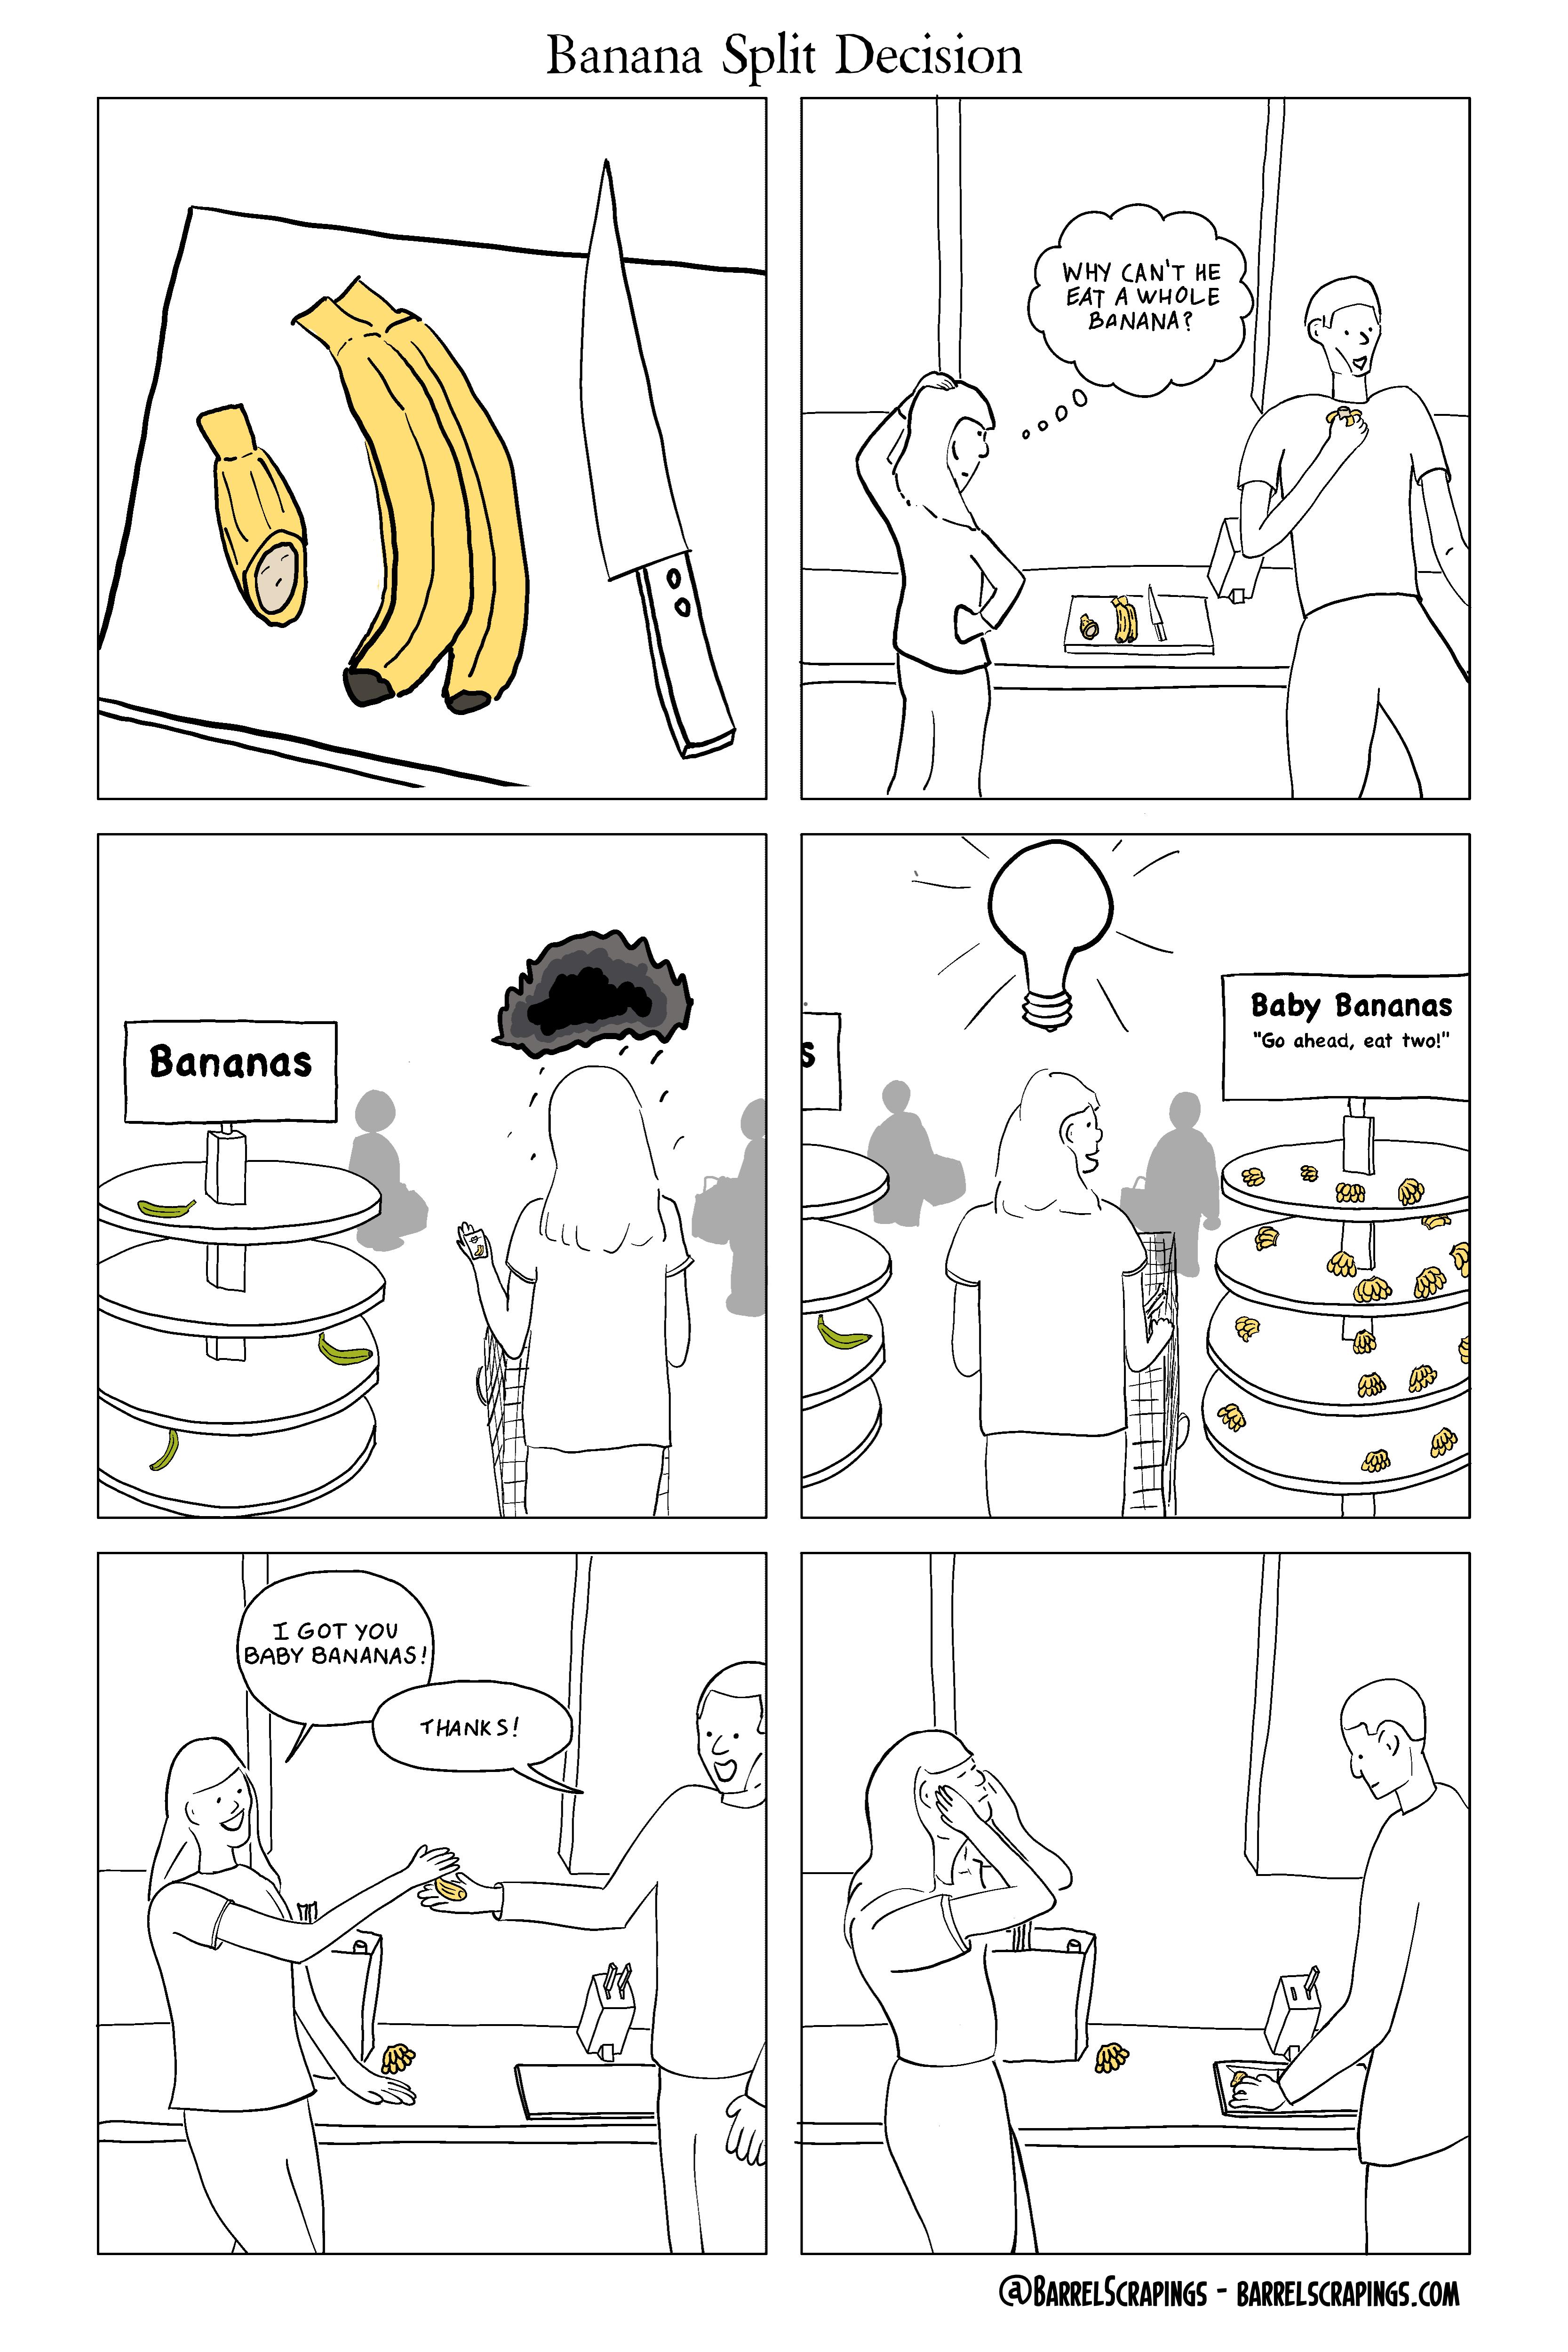 image from Banana Split Decision